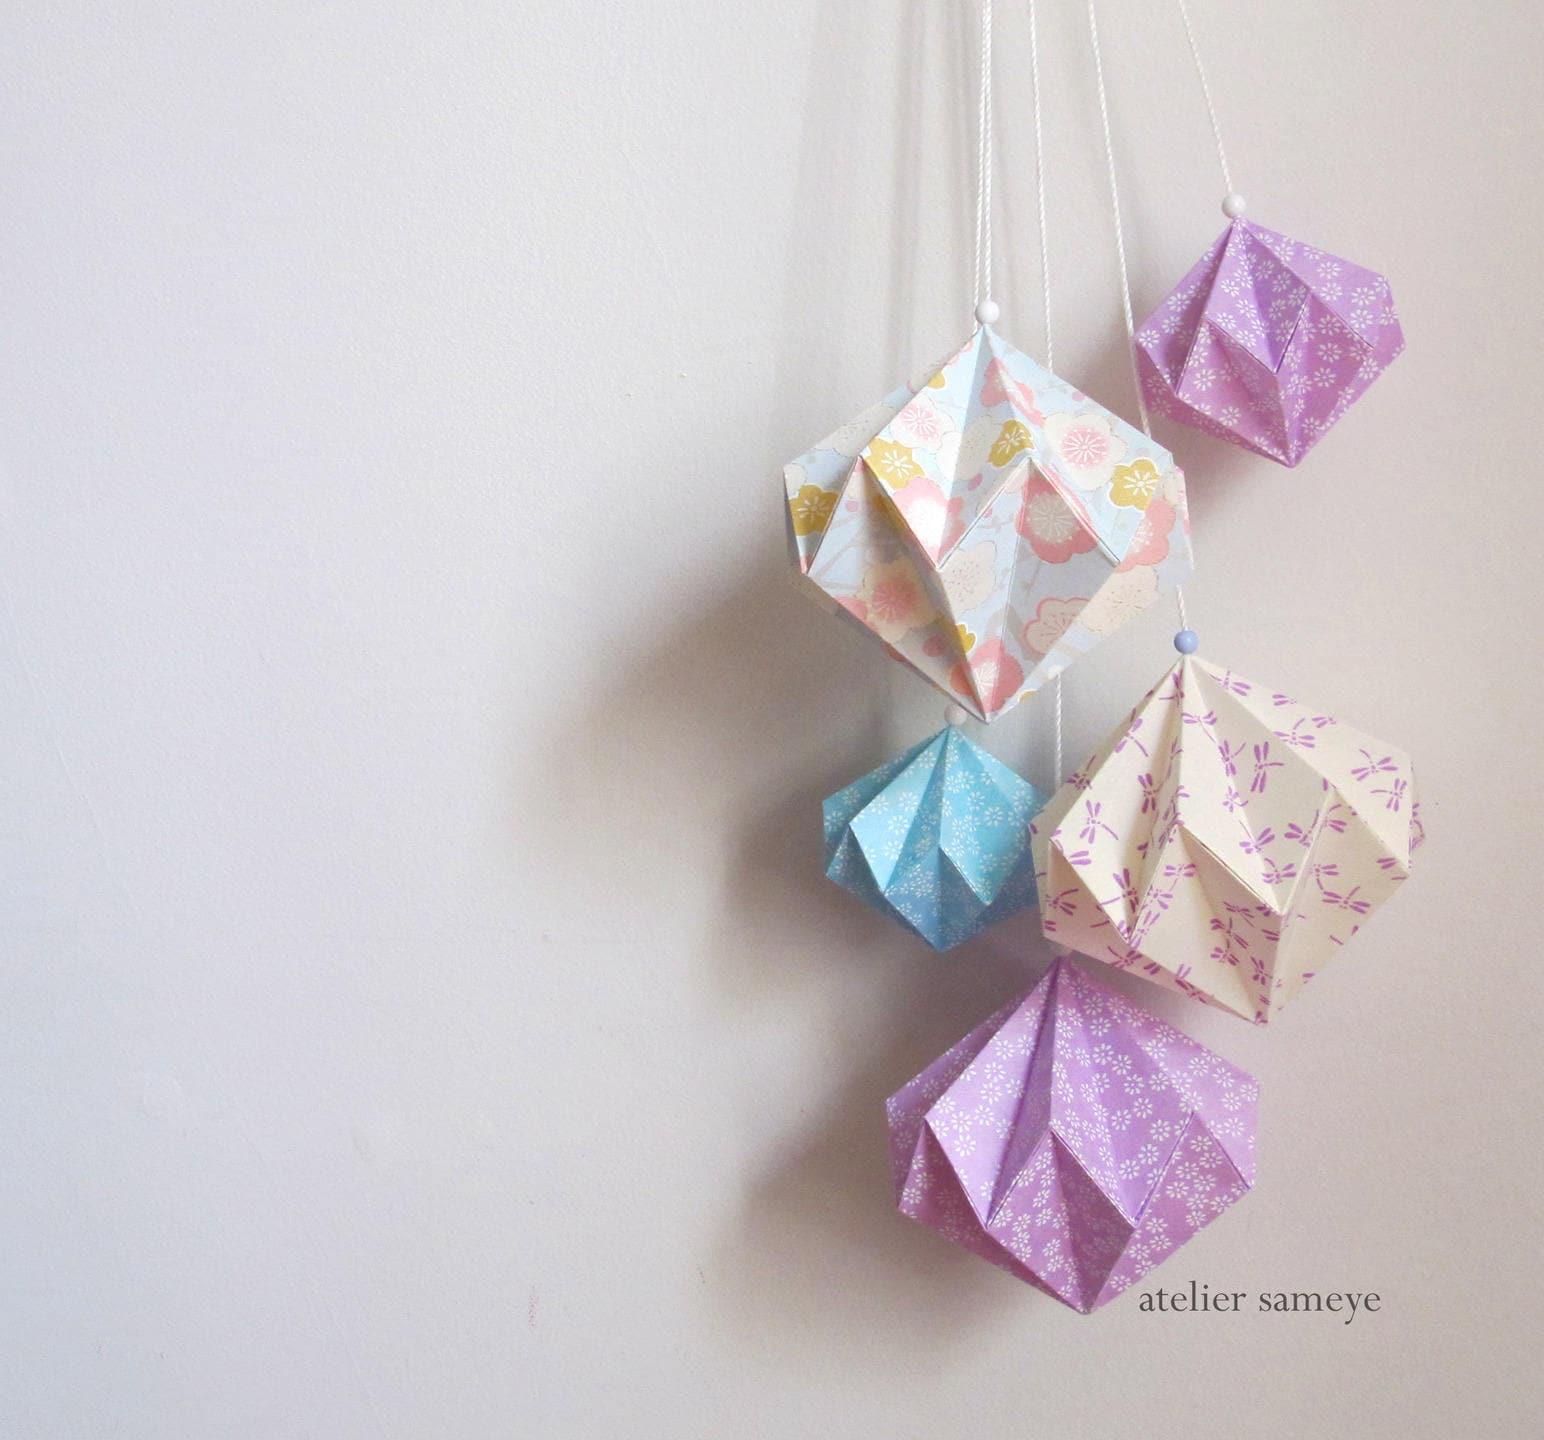 d coration murale grappe diamants origami mauve libellule. Black Bedroom Furniture Sets. Home Design Ideas